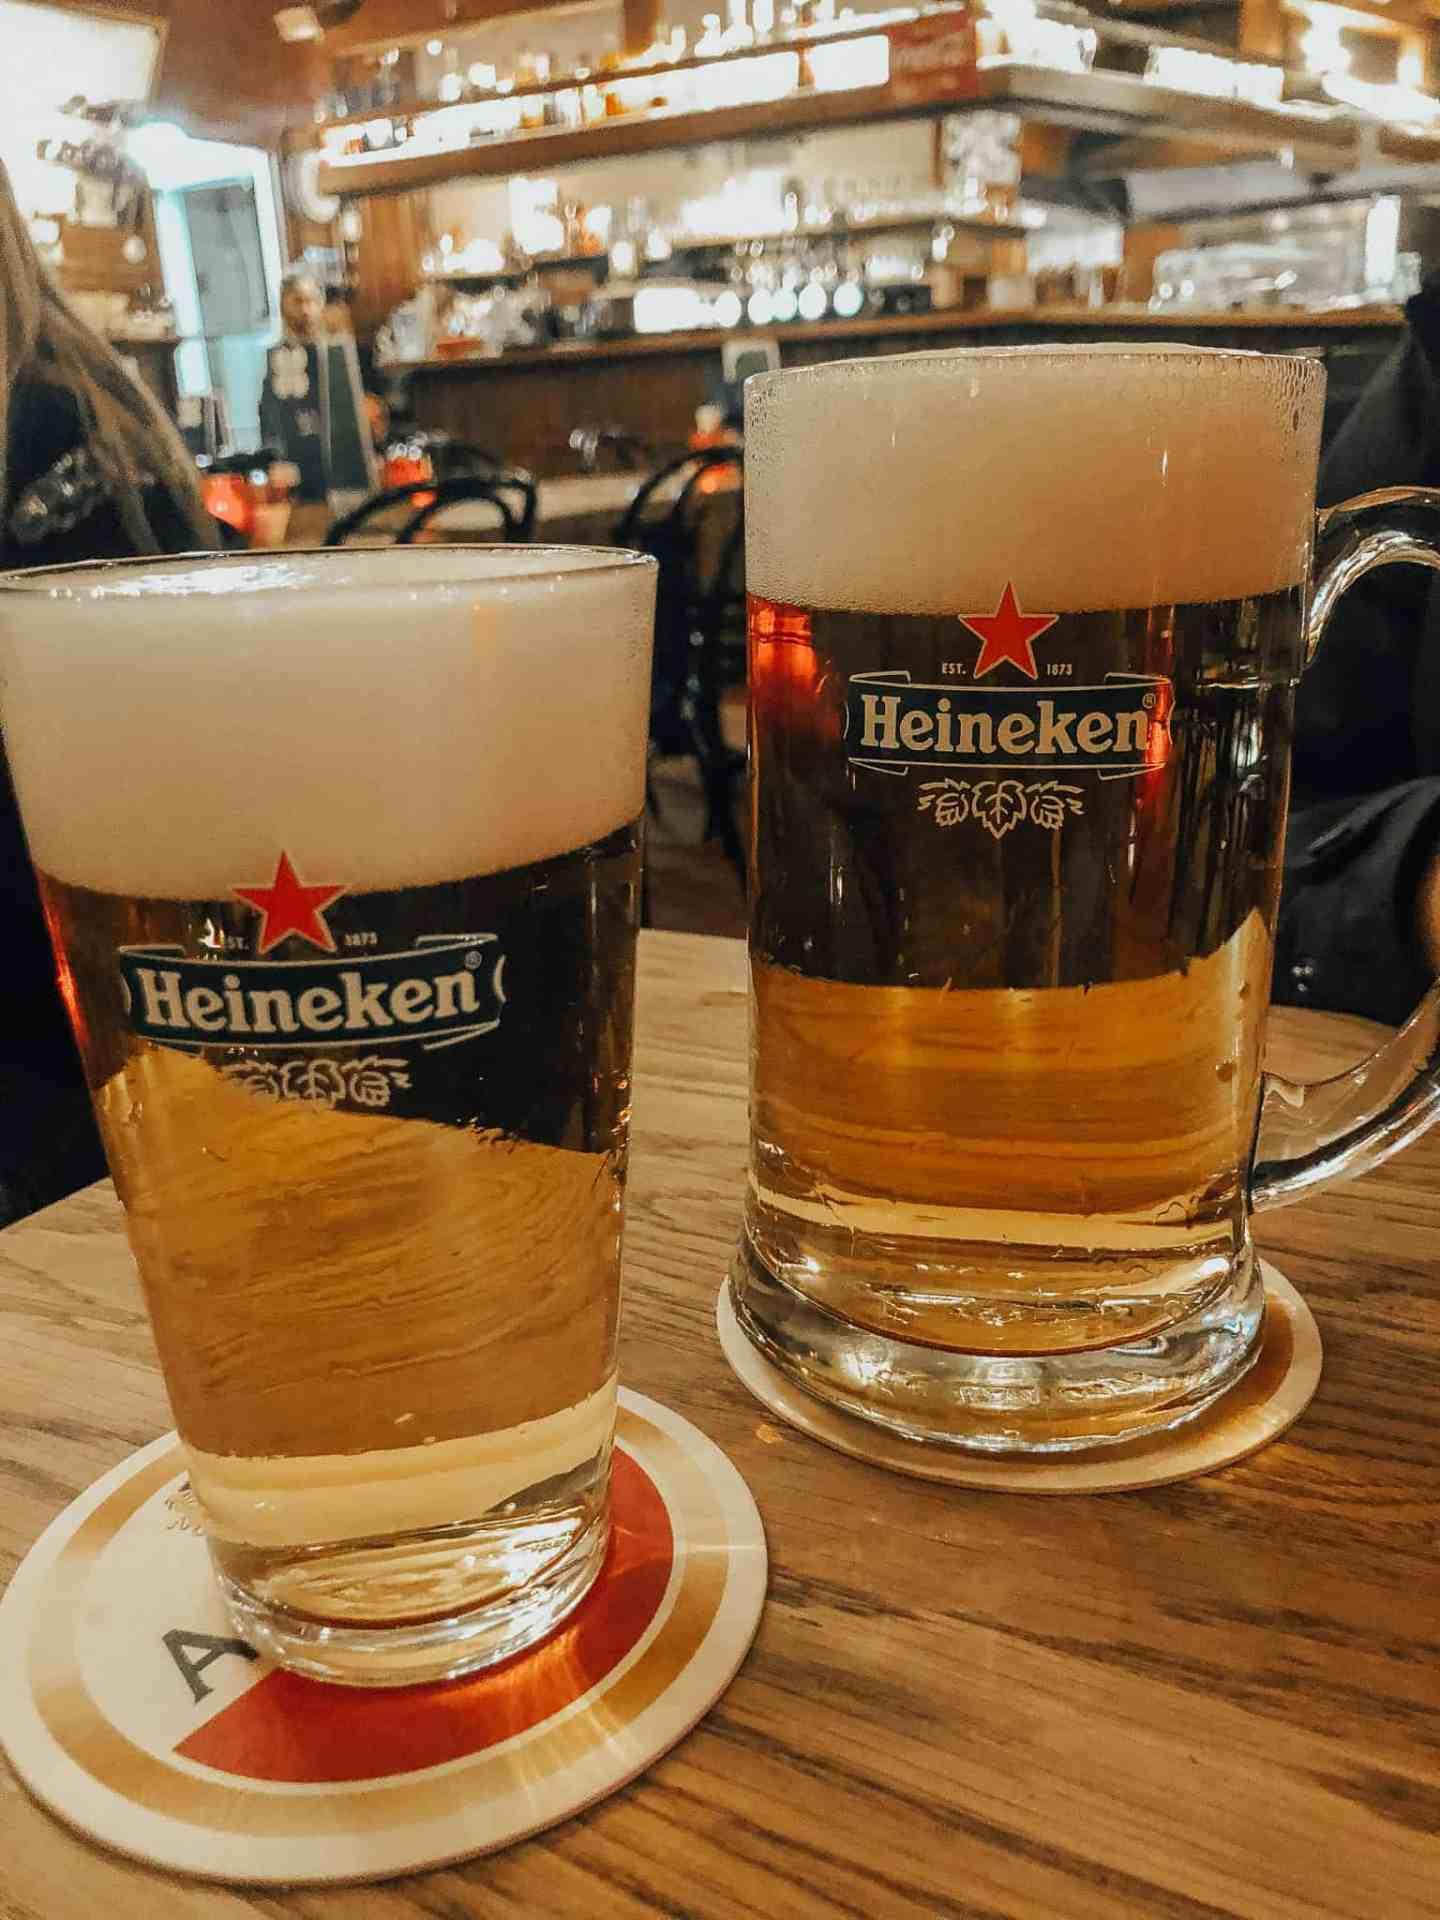 Heineken's to end the walking tour